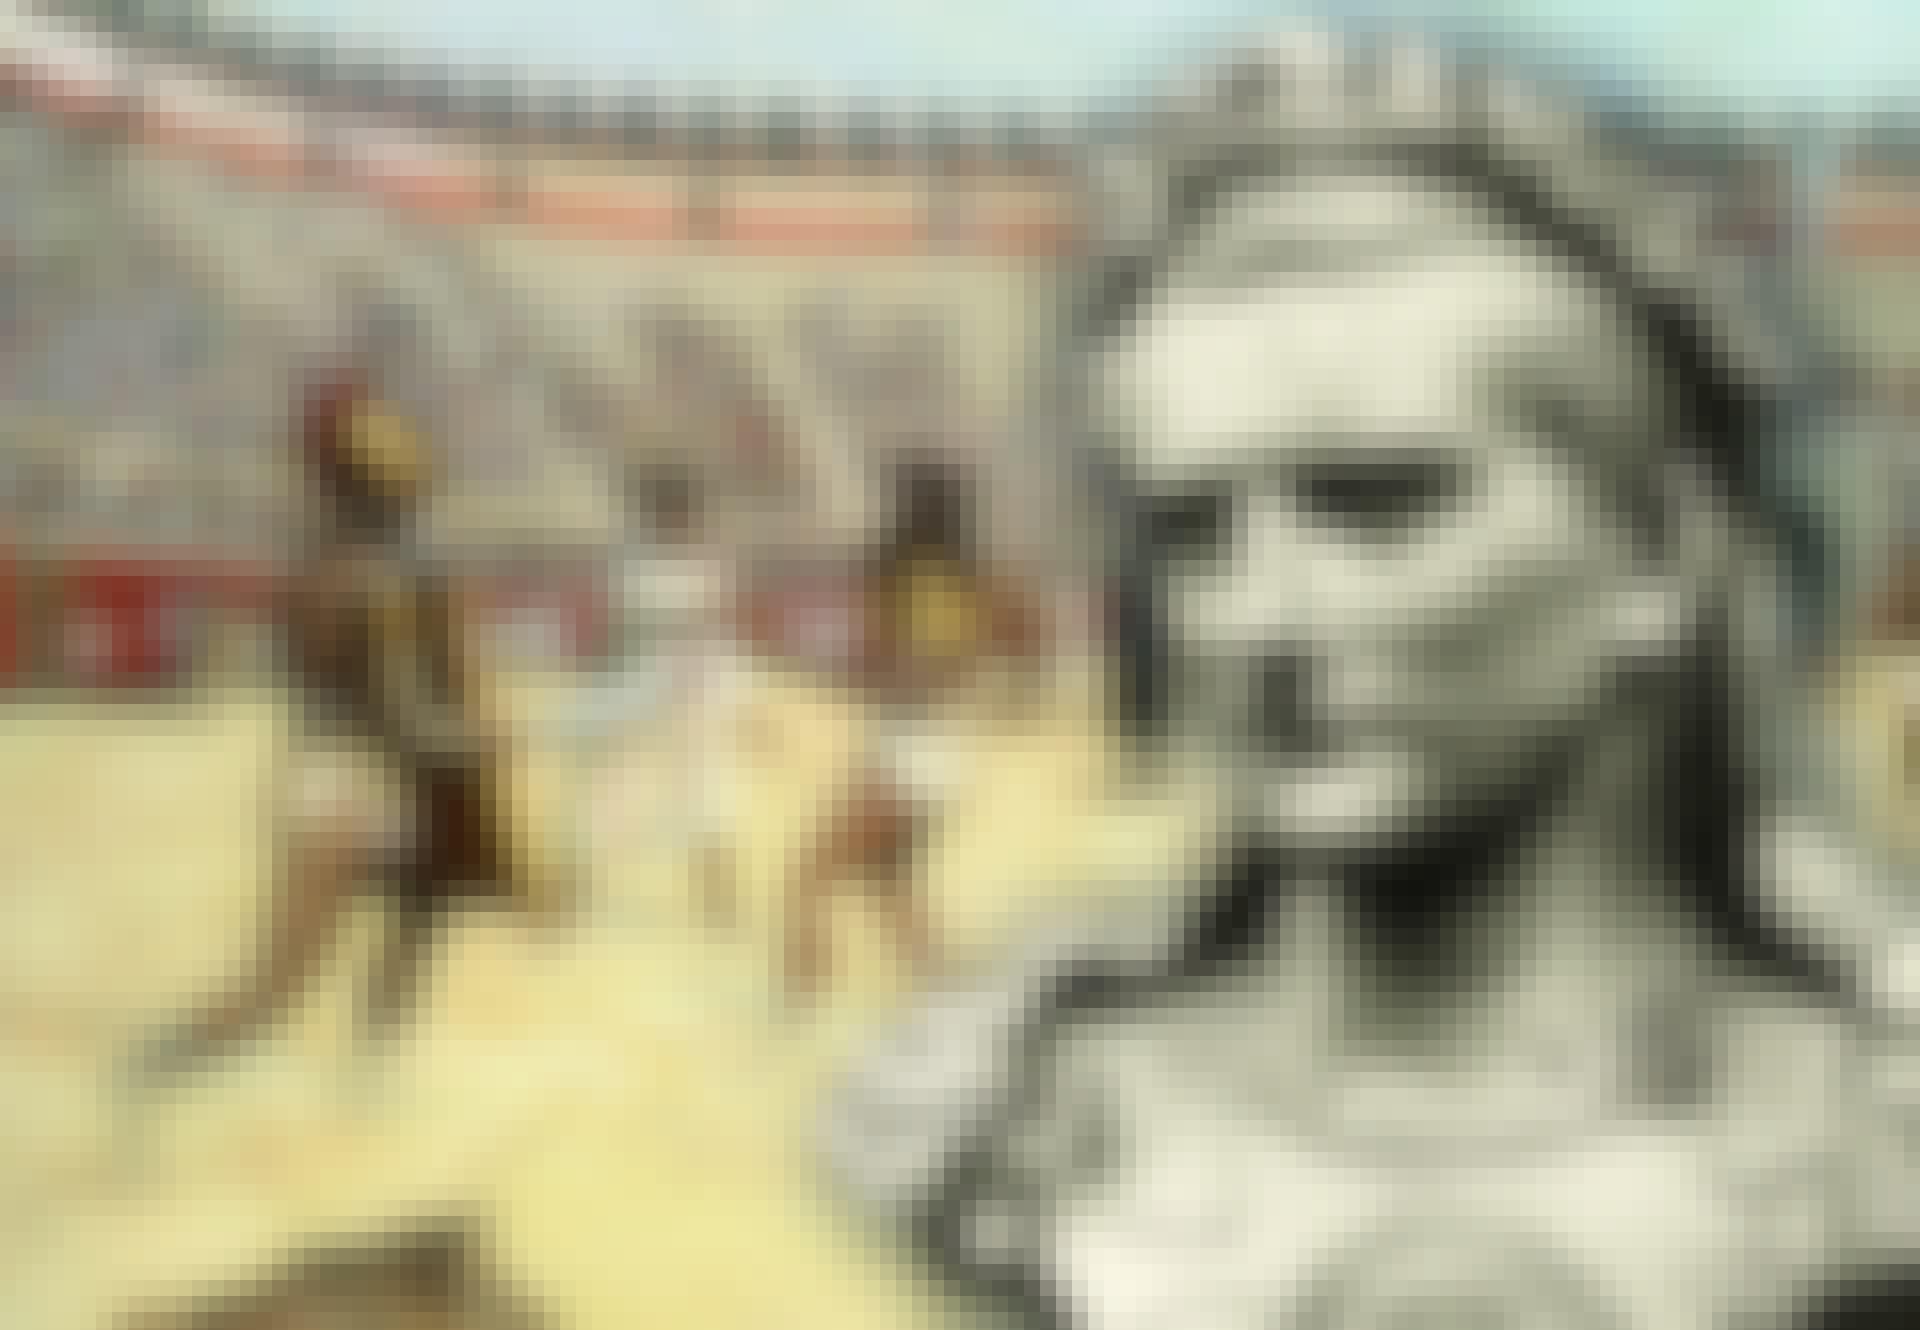 Kejser Caligula